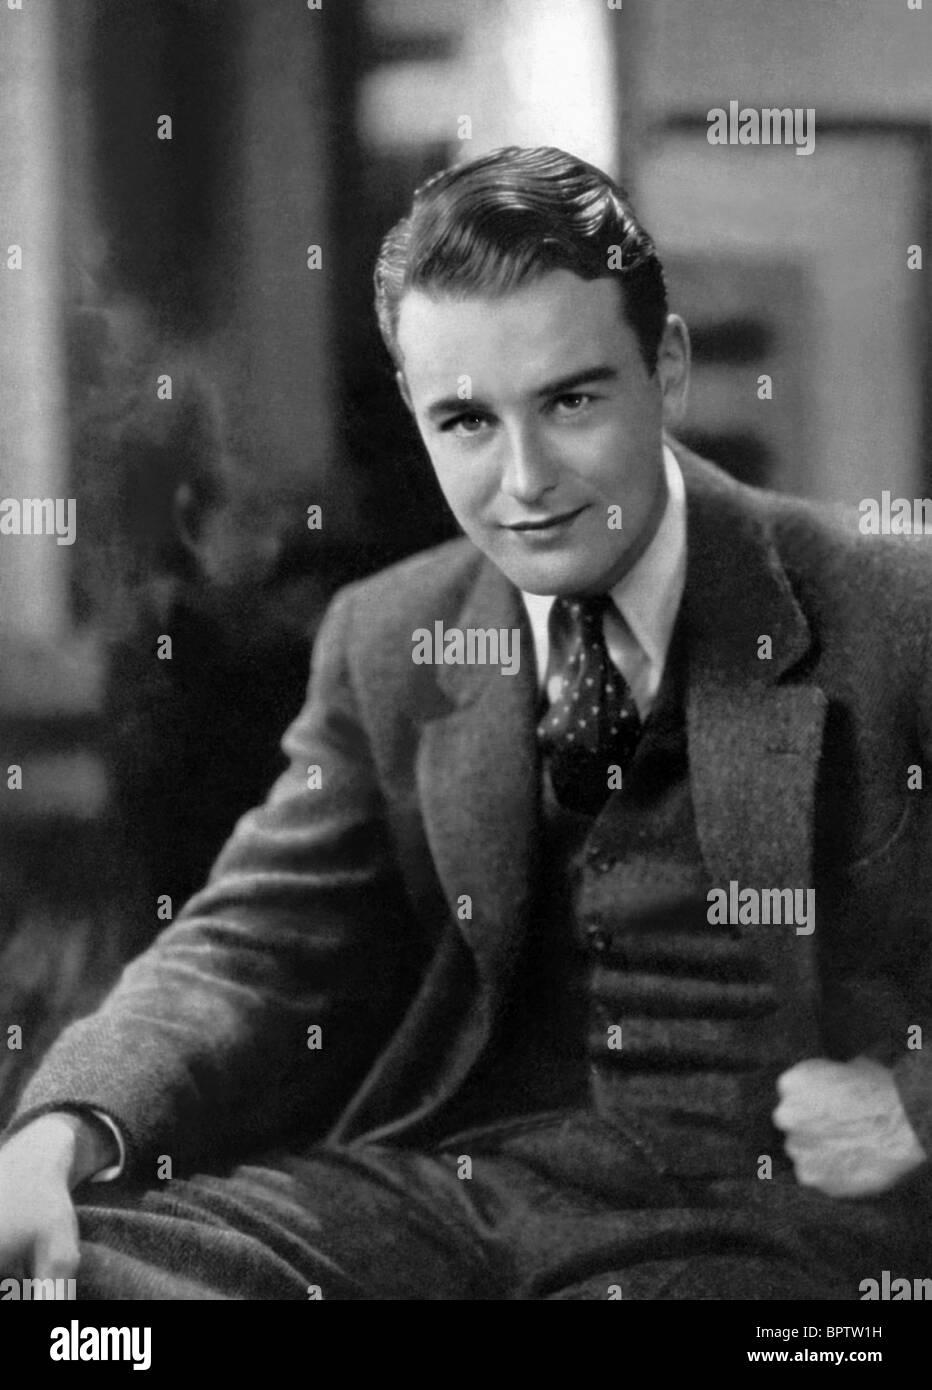 LEW AYRES ACTOR (1931) - Stock Image